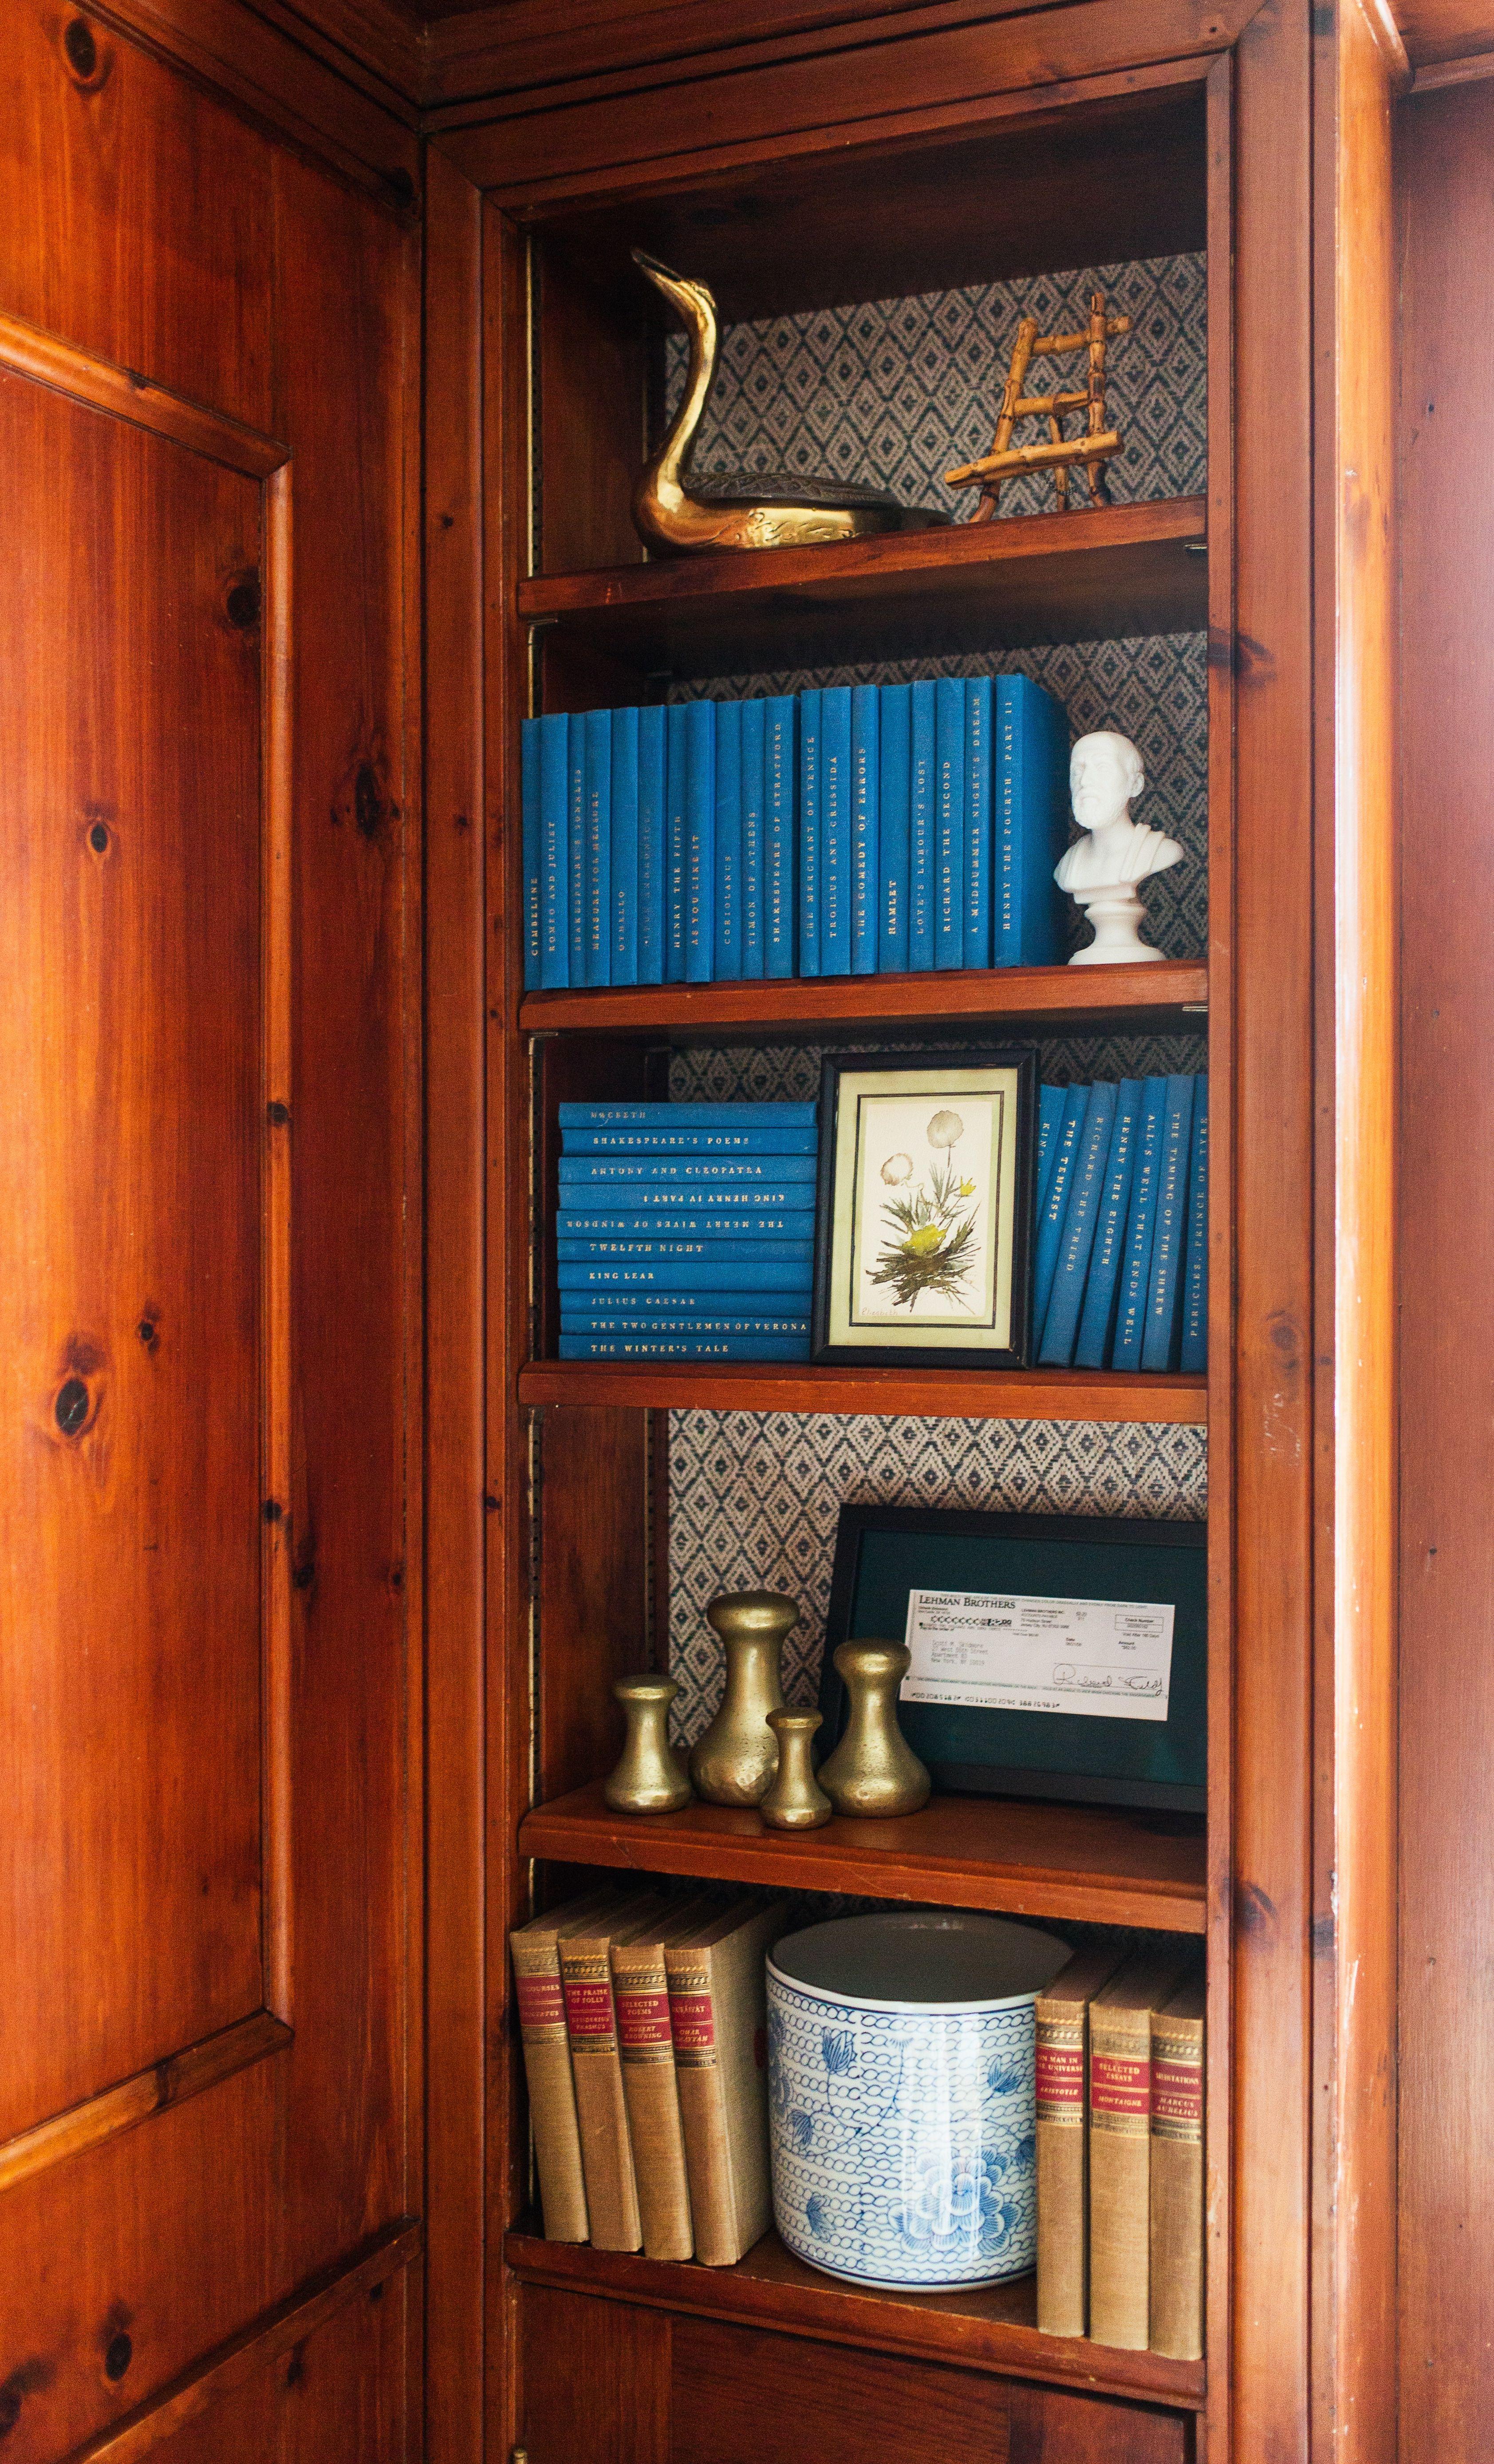 Wood Paneled Library: Library // Bookshelf // Wood Paneled Walls // Project